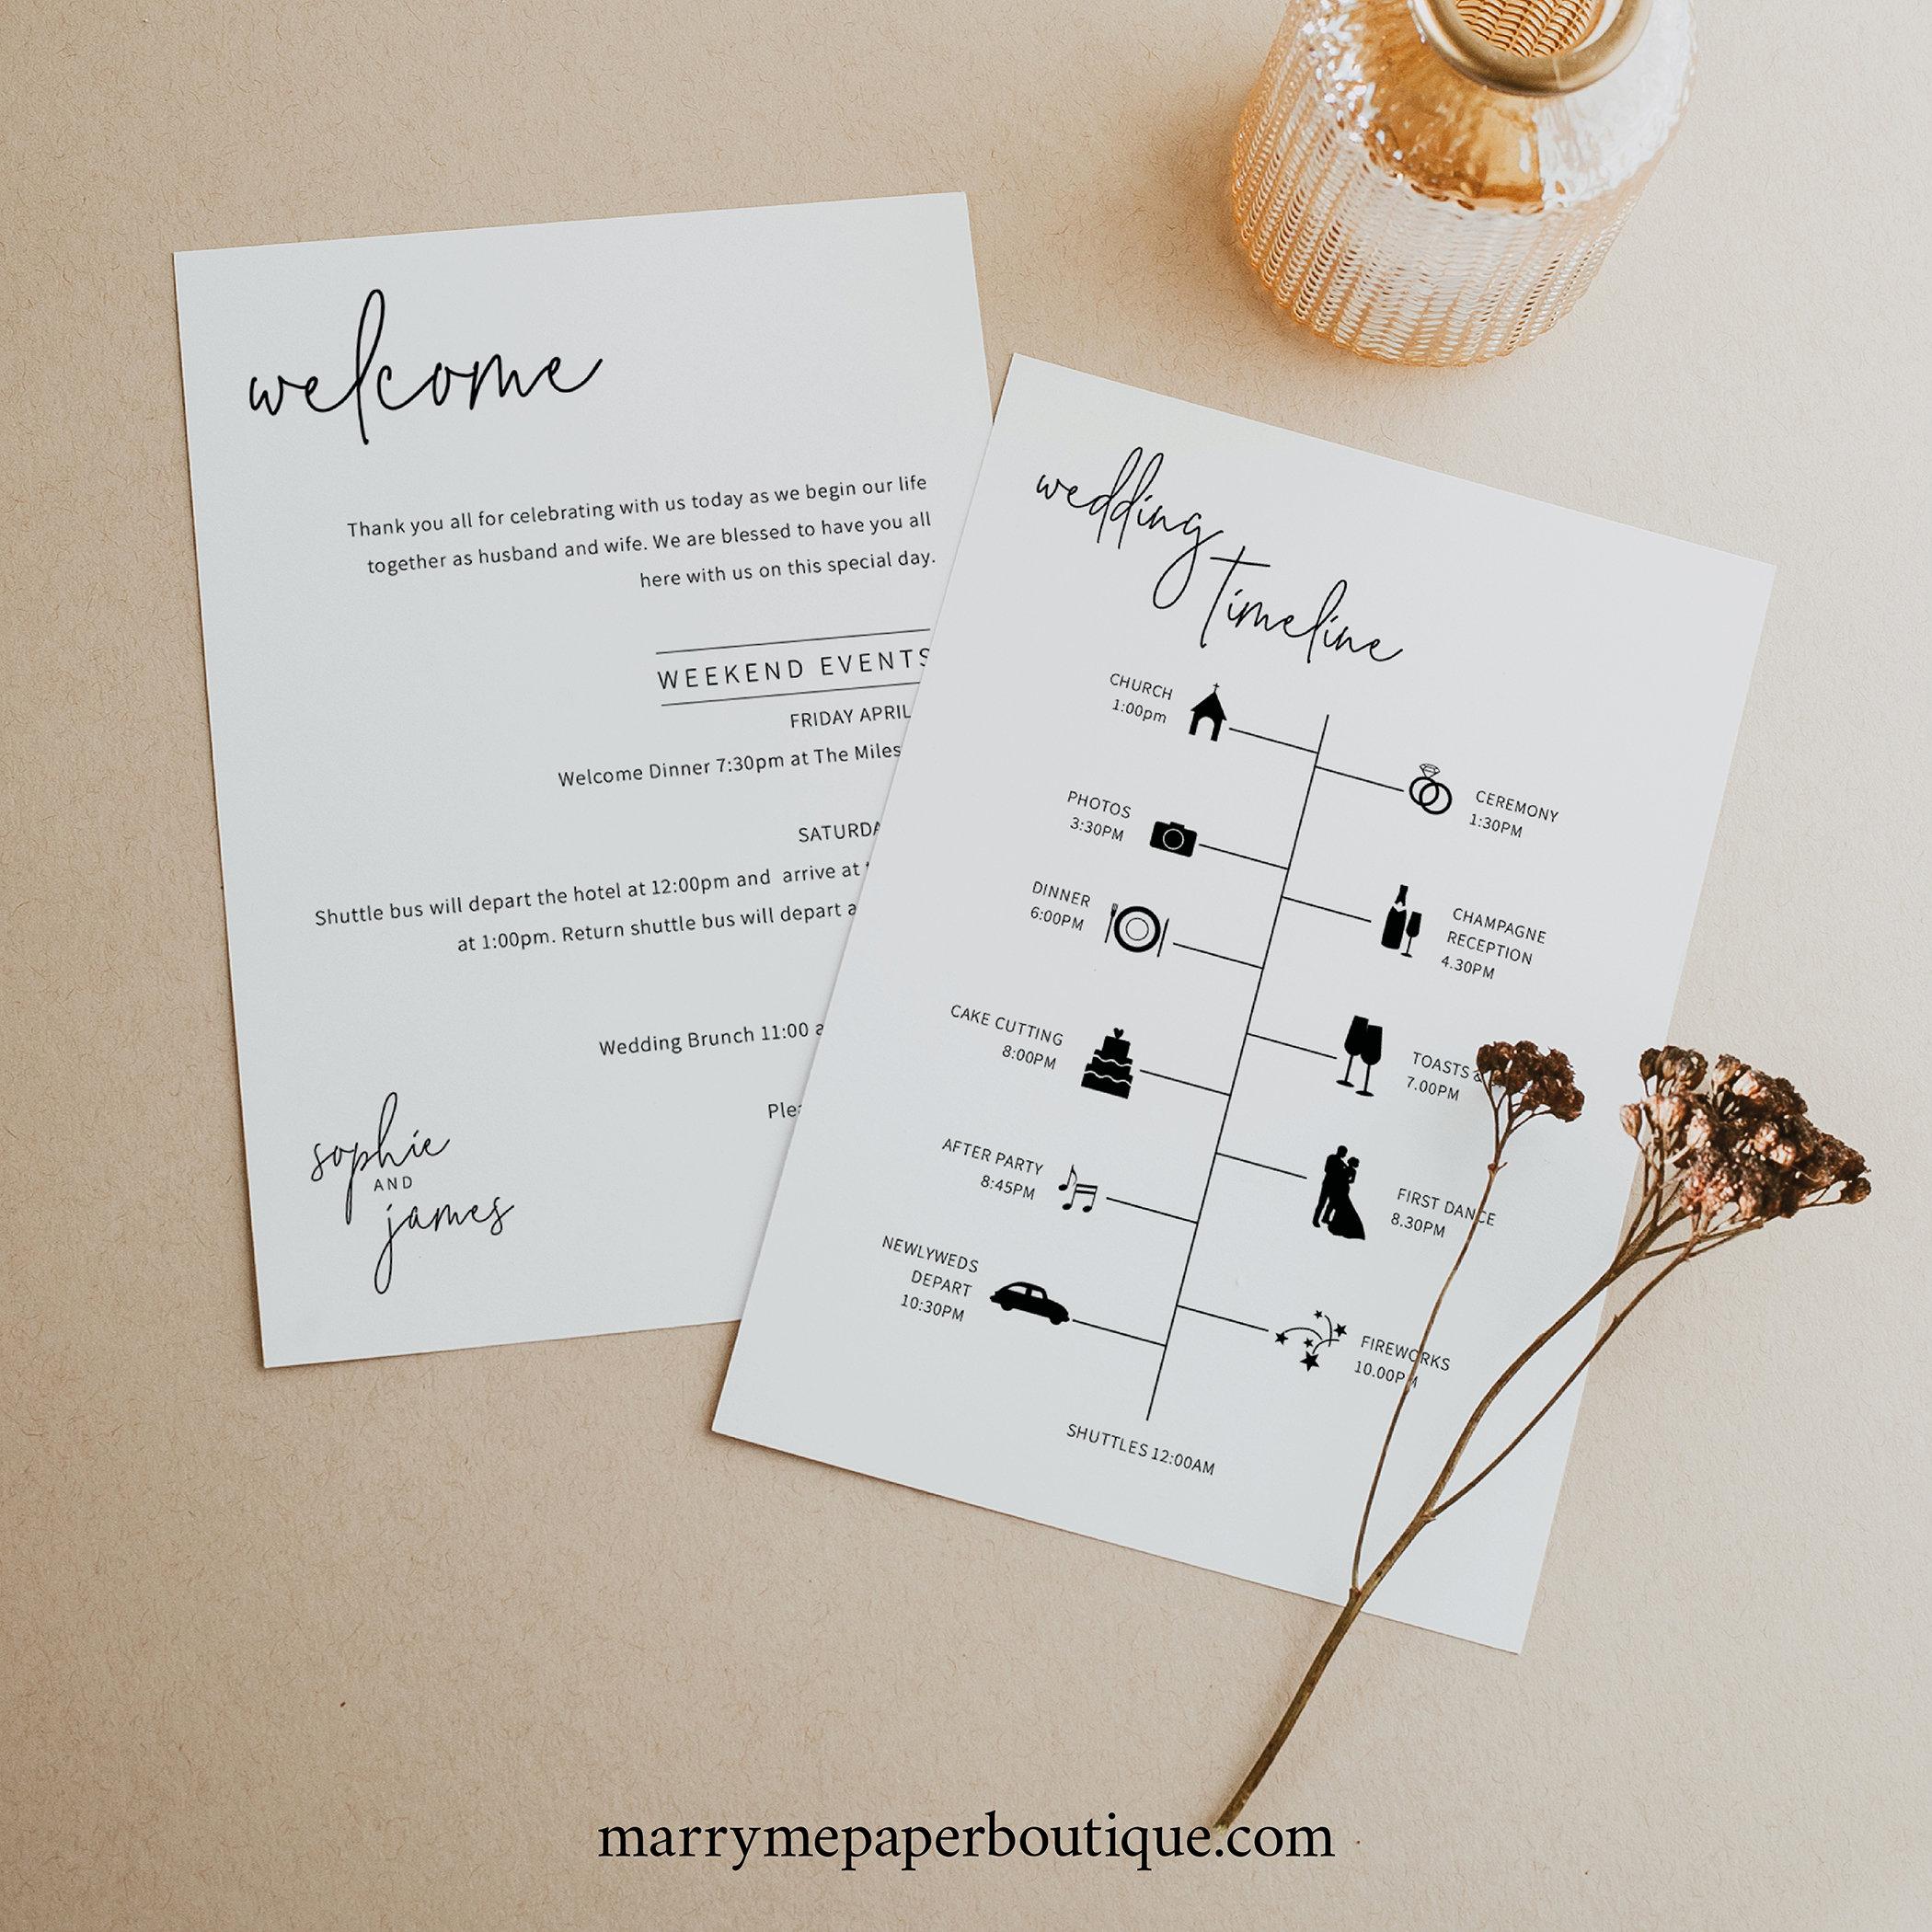 Wedding Itinerary Card Template Minimalist Elegant throughout Honeymoon Itinerary Template